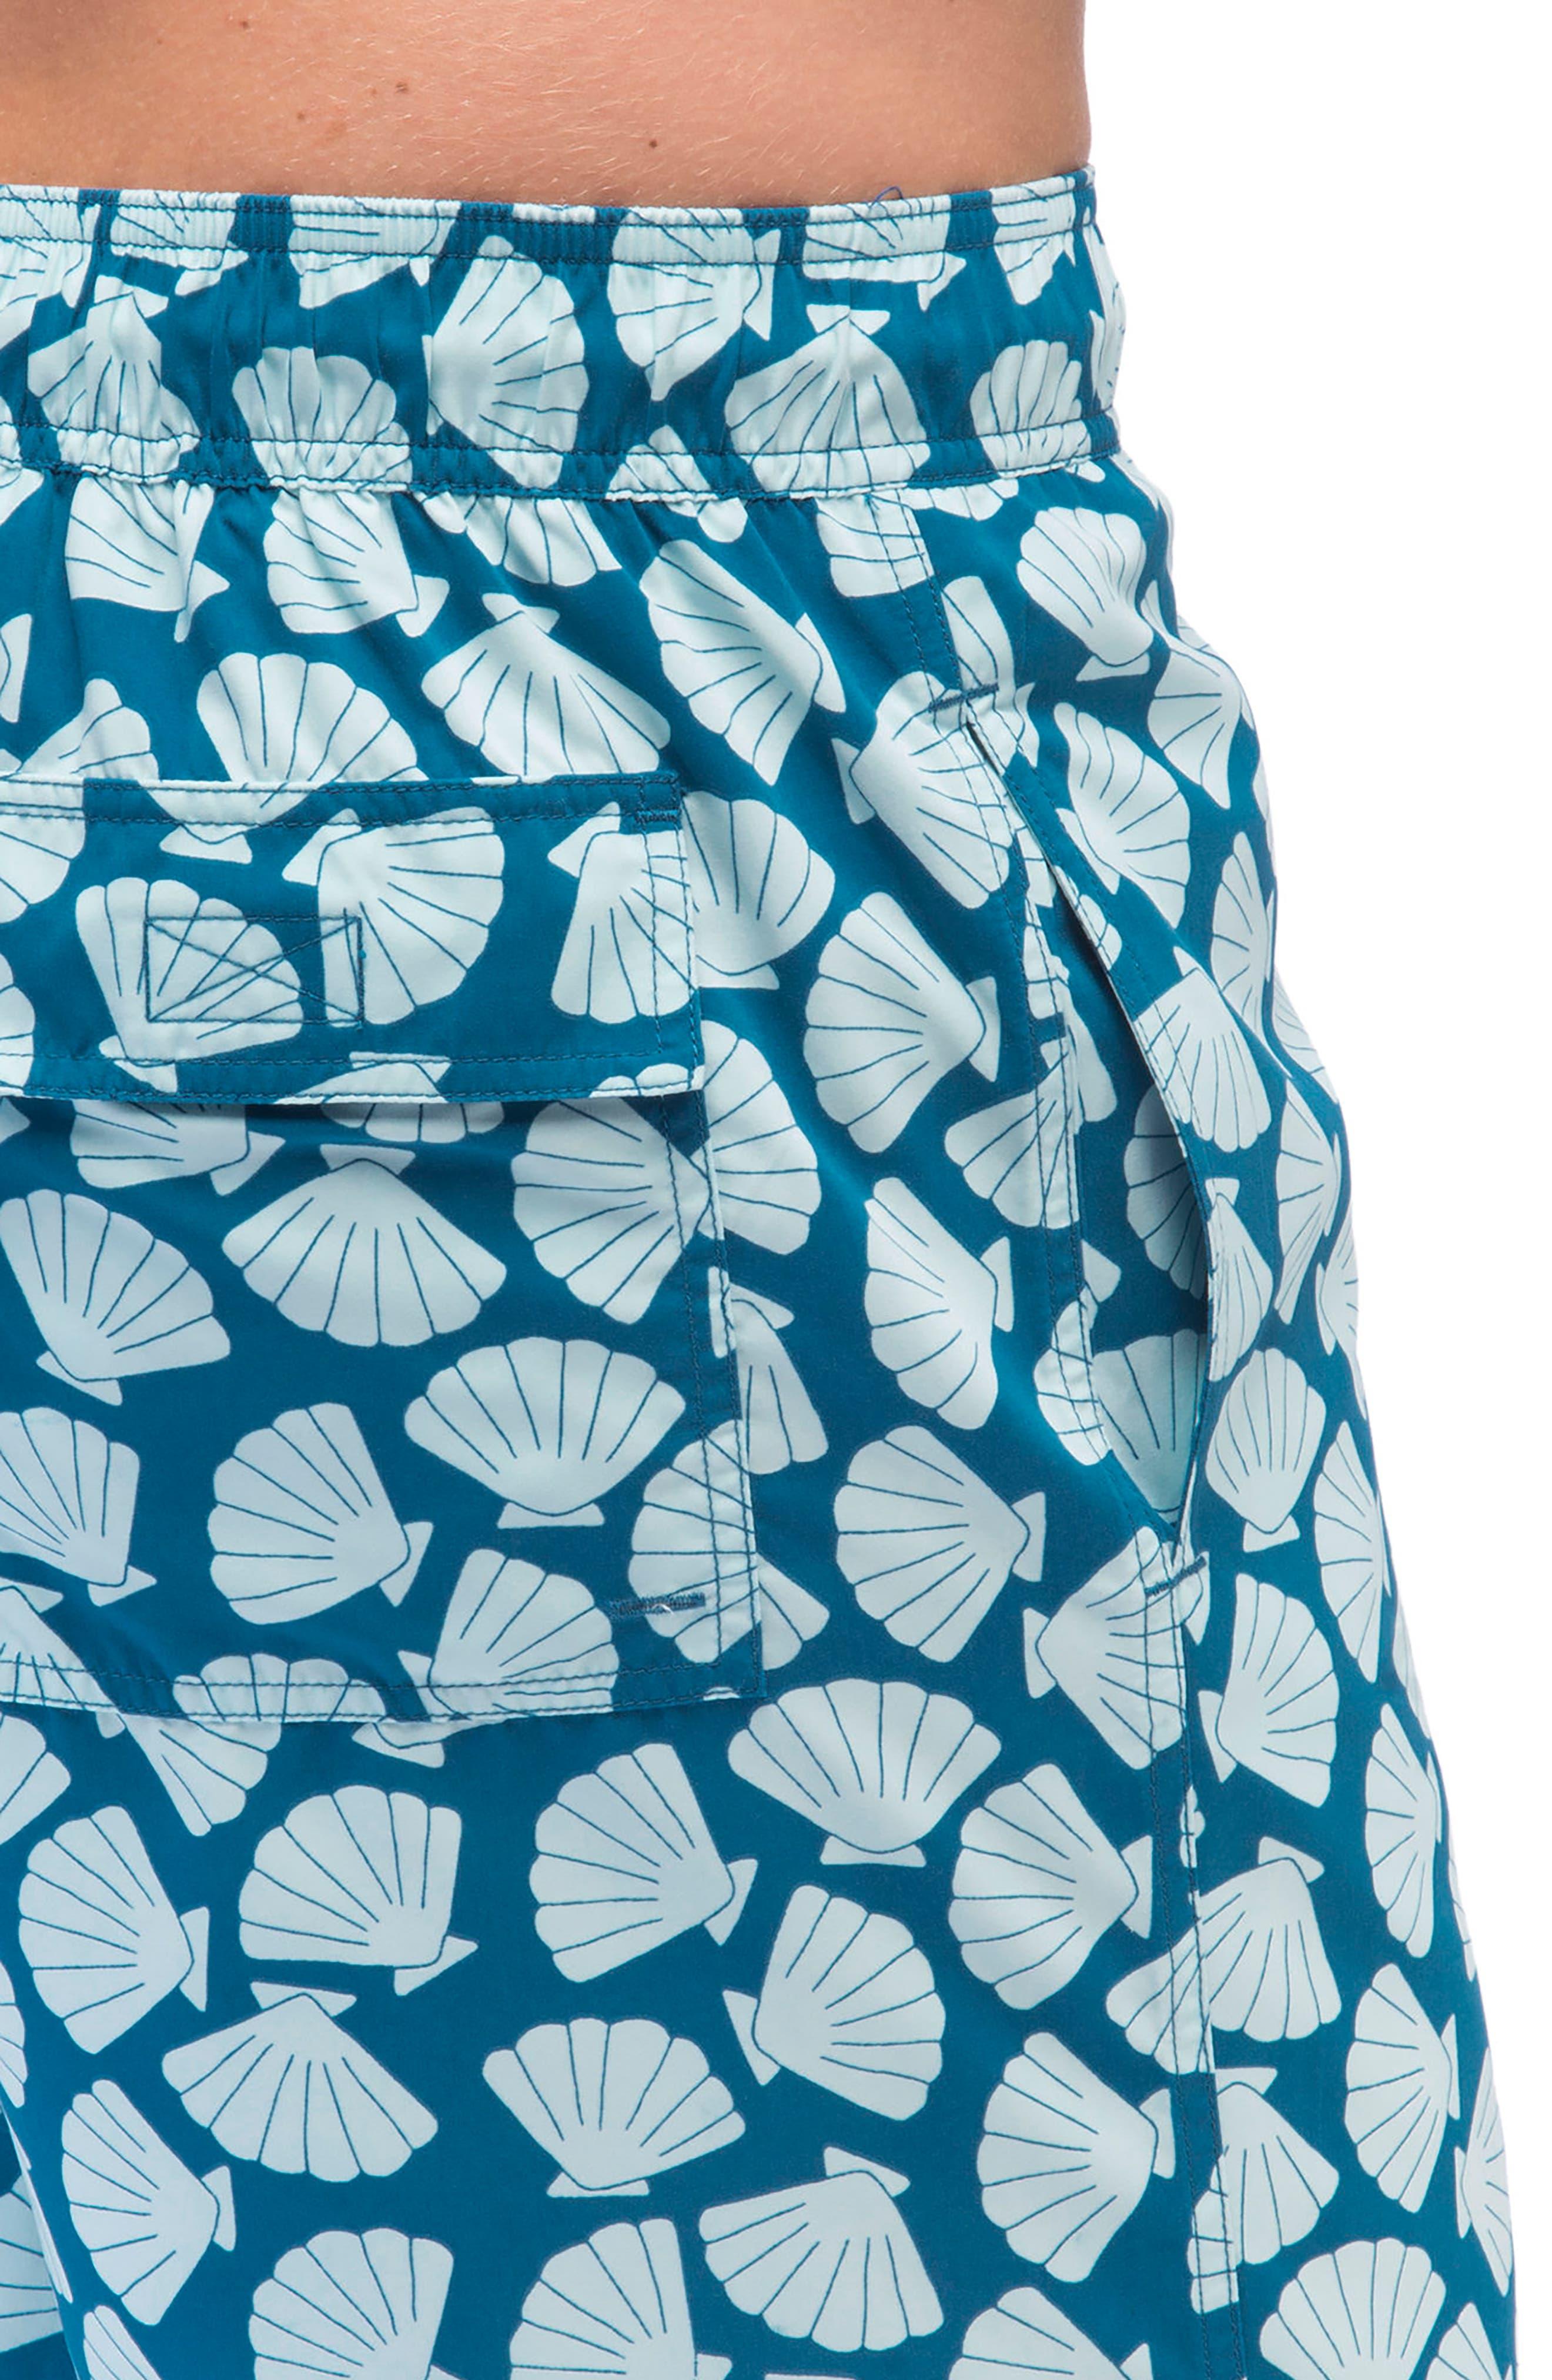 Shell Print Swim Trunks,                             Alternate thumbnail 3, color,                             BLUE